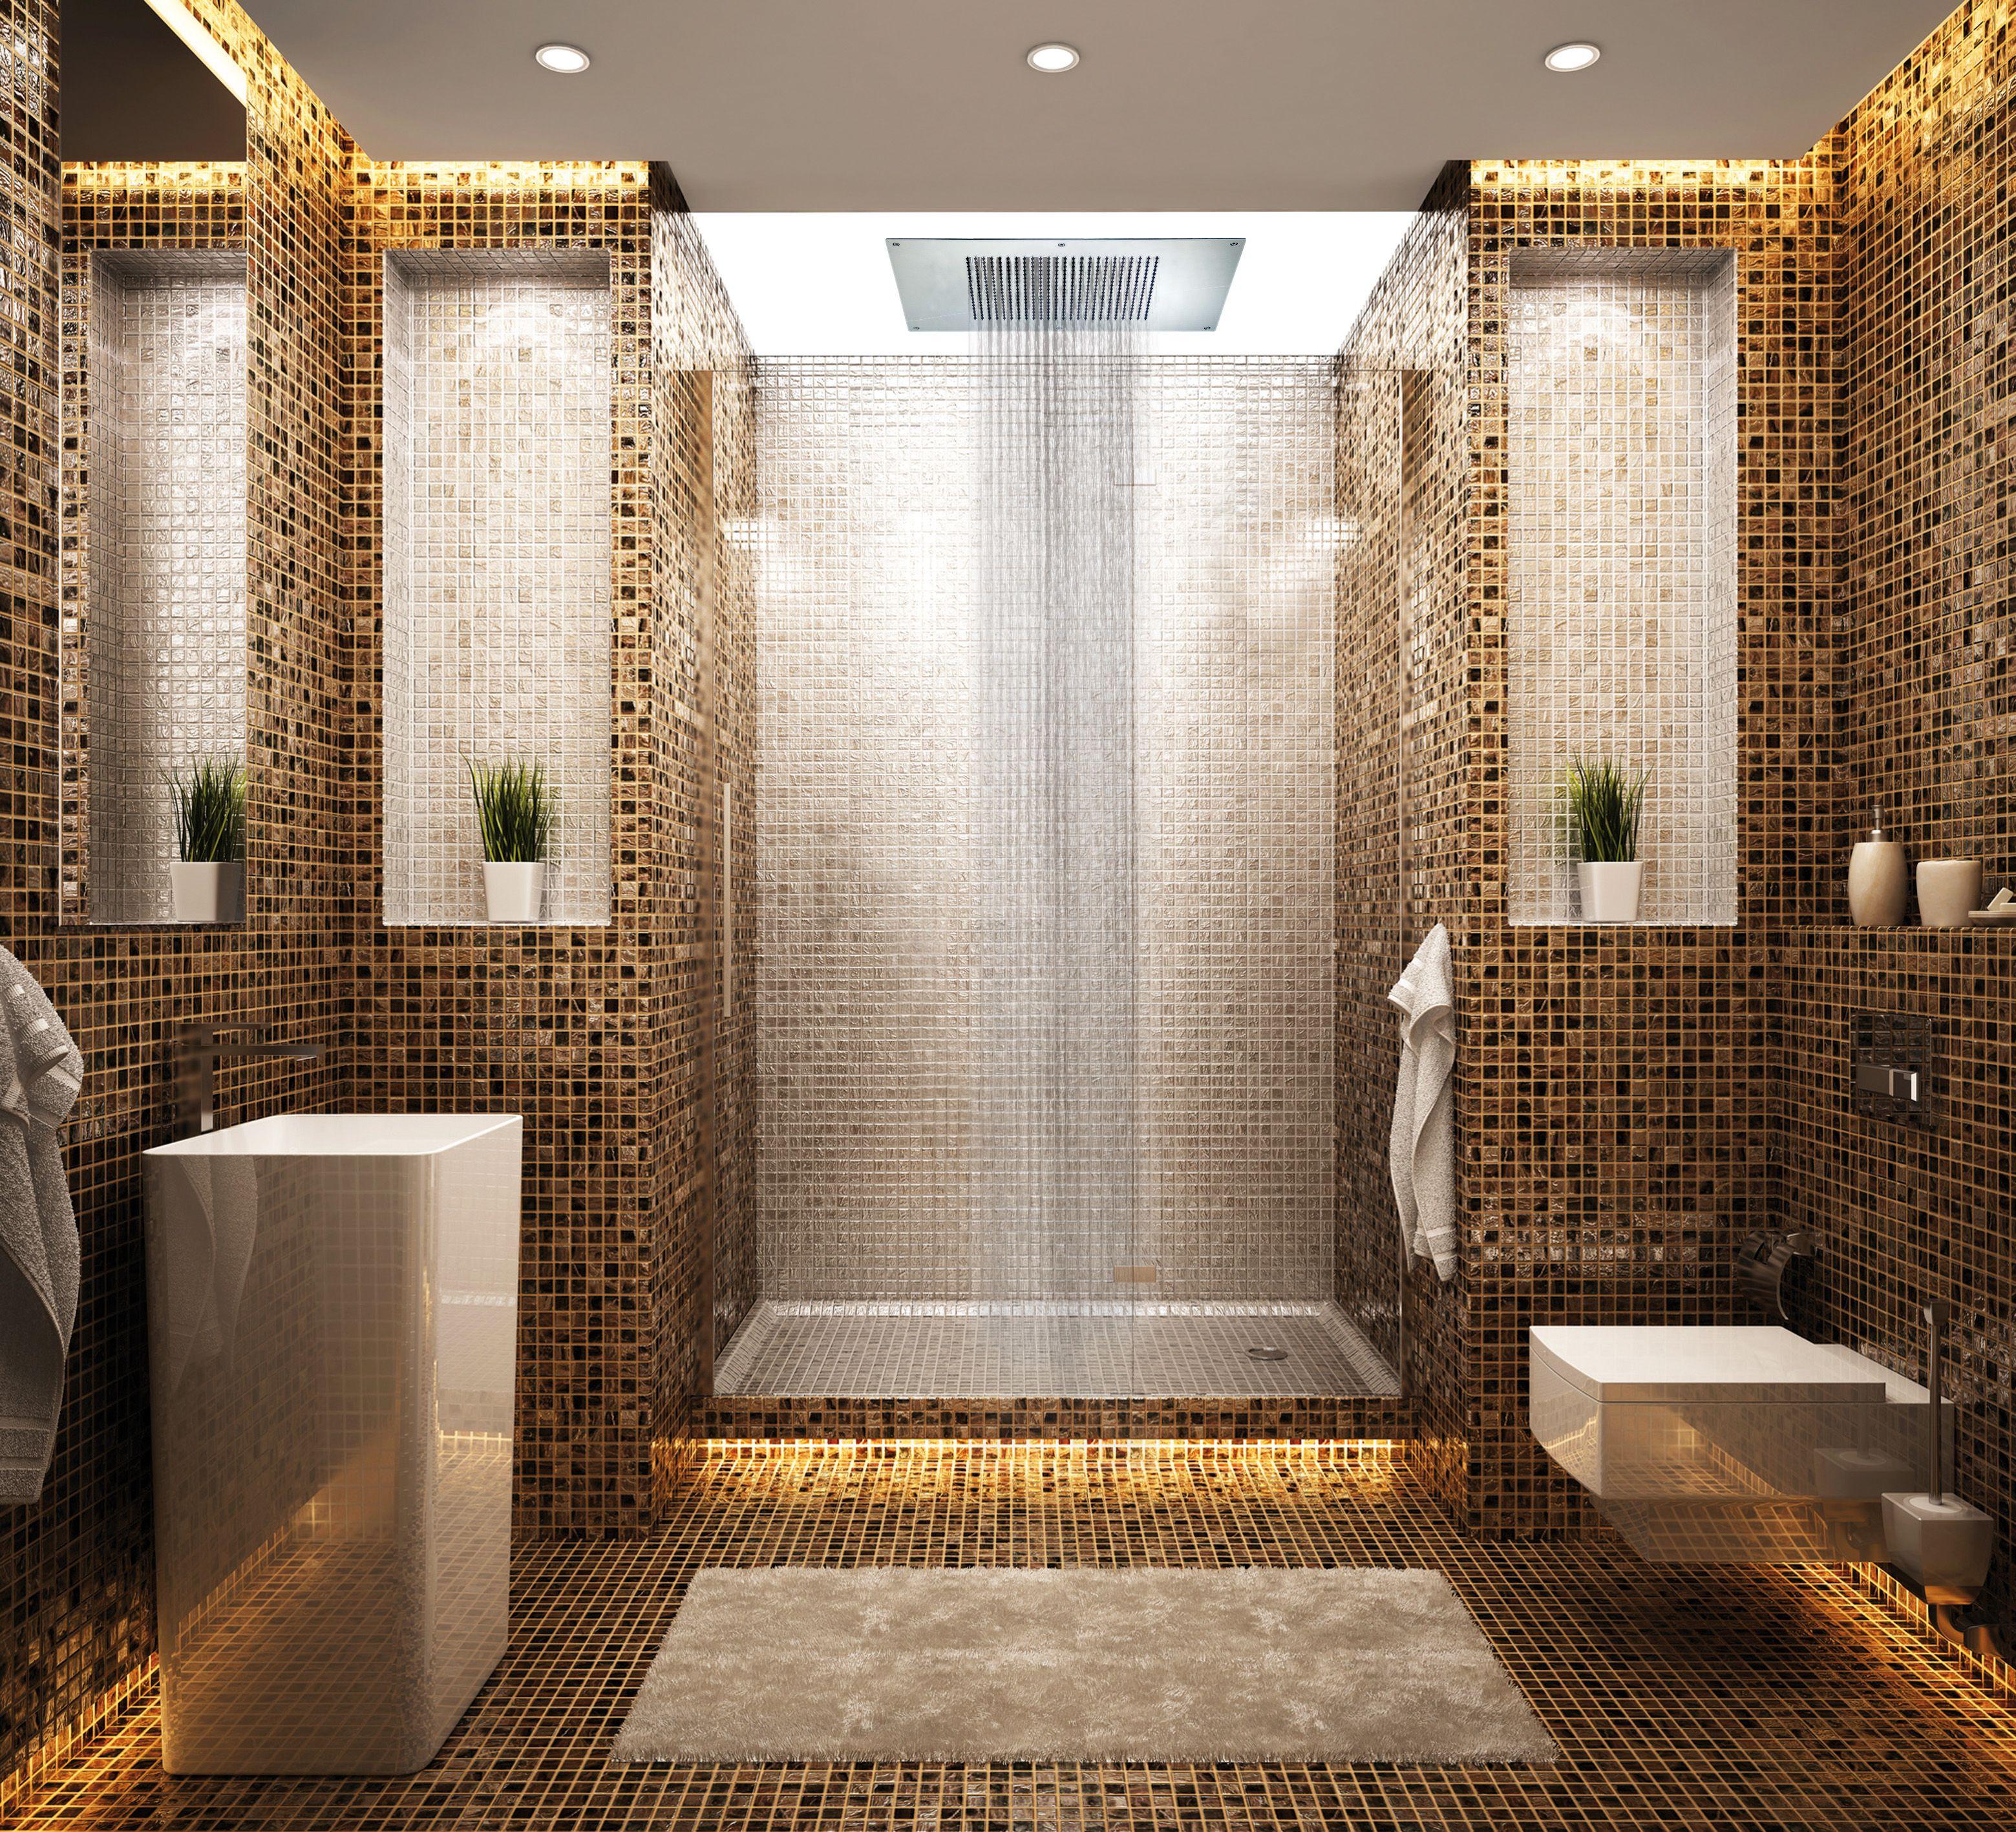 Average Labor Cost For Bathroom Remodel: Recessed Rainhead. Aquabrass. #Rainhead #bathroom #Design